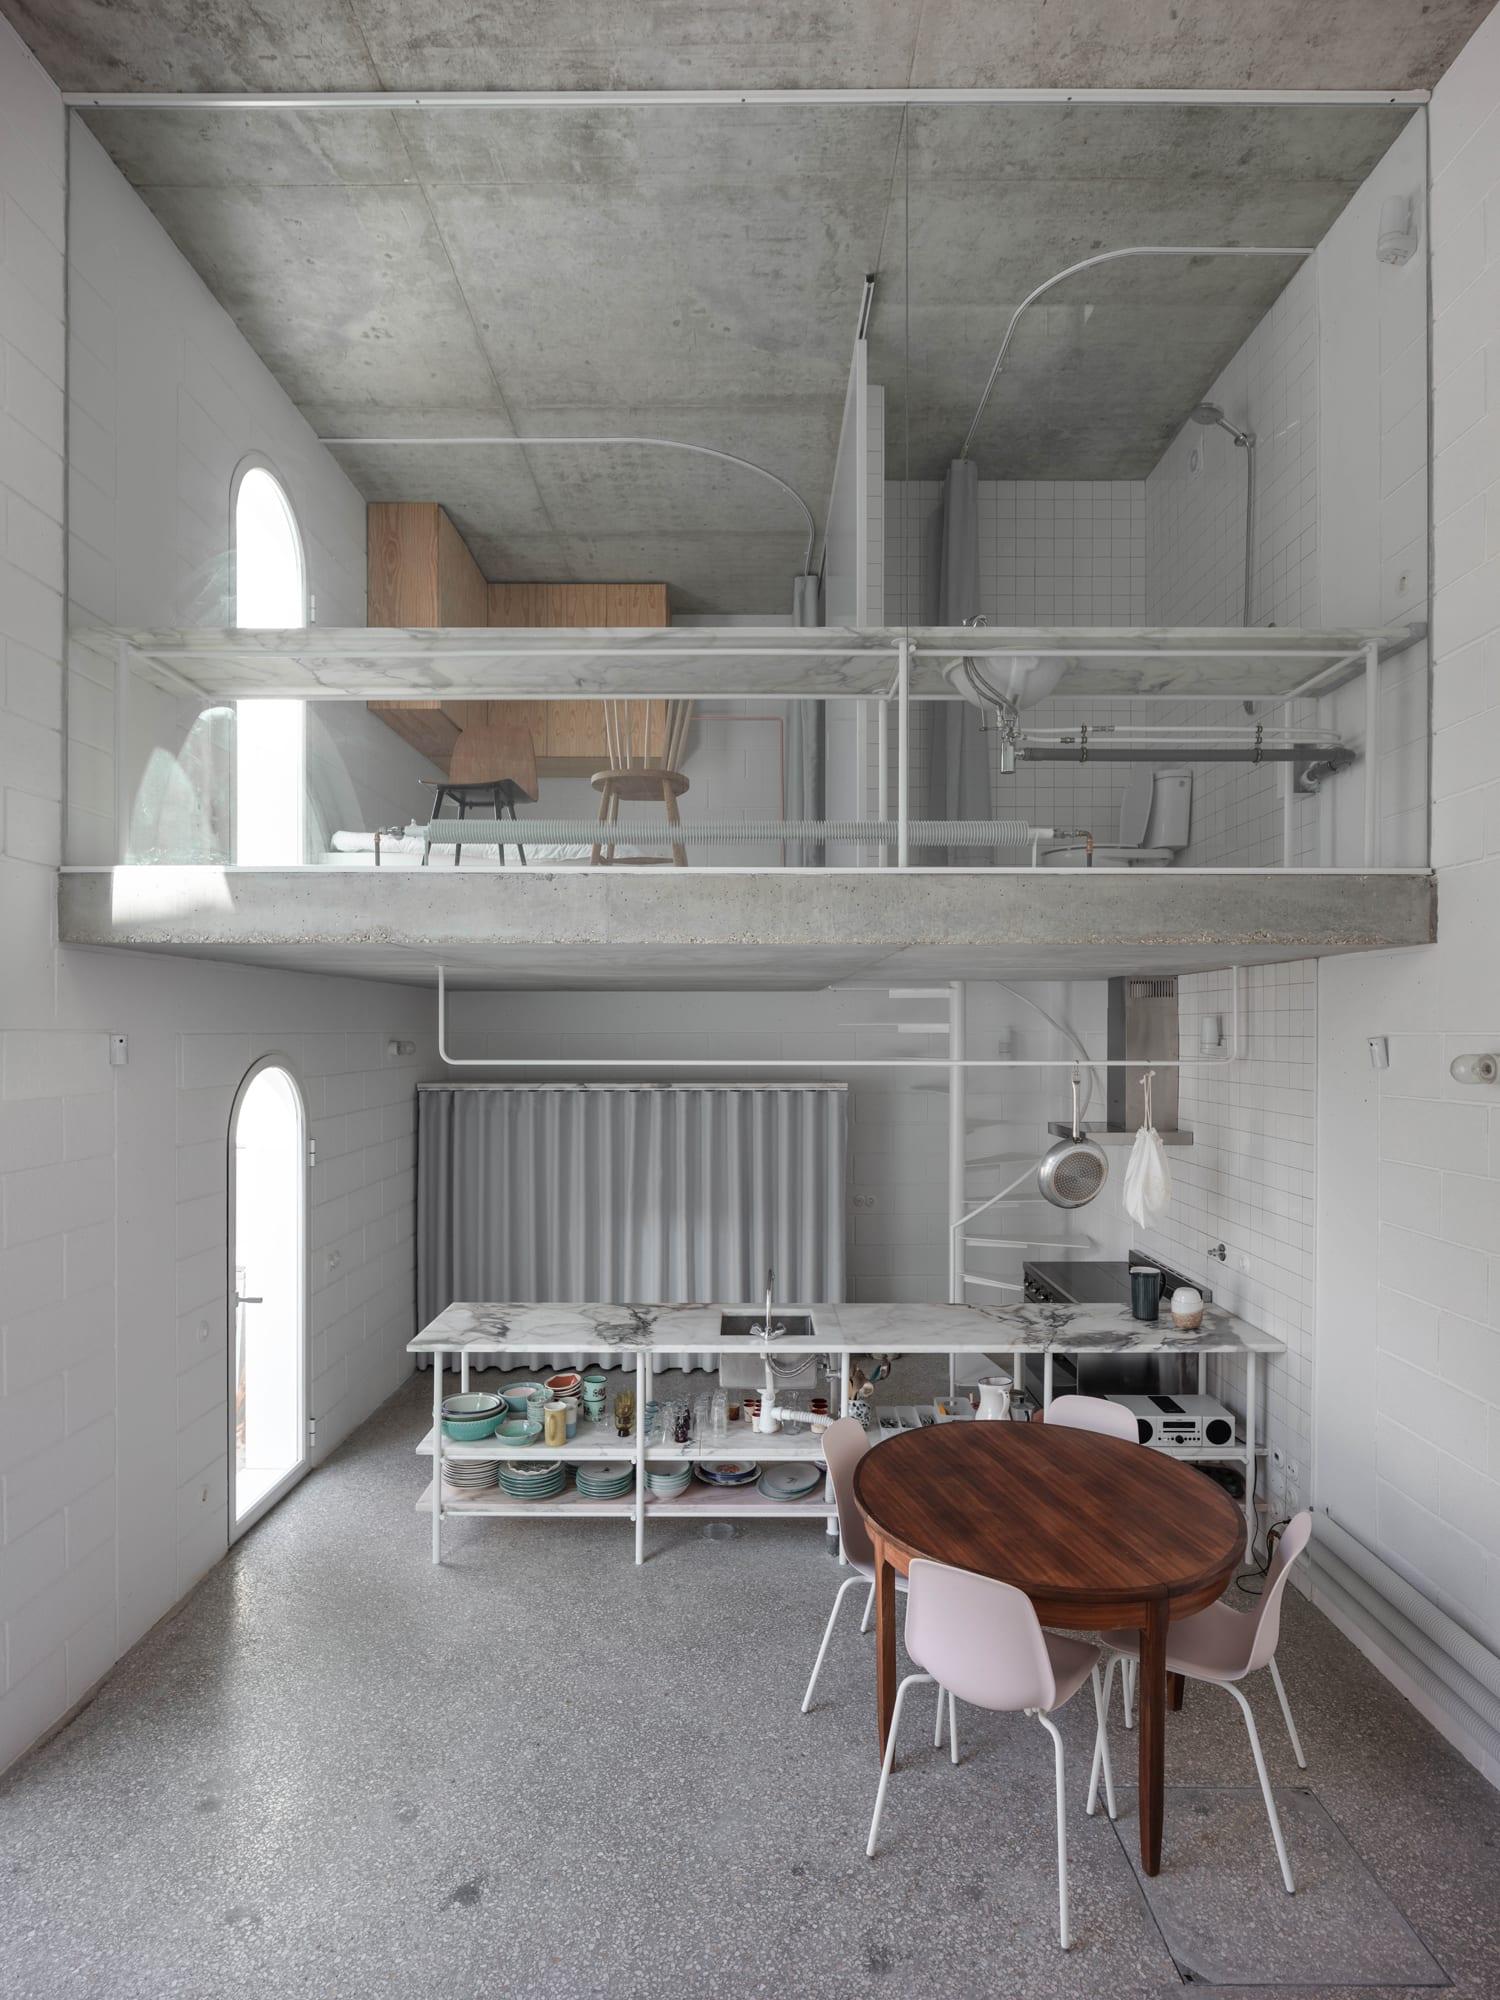 Dodged House In Lisbon By Leopold Banchini Daniel Zamarbide Yellowtrace 07